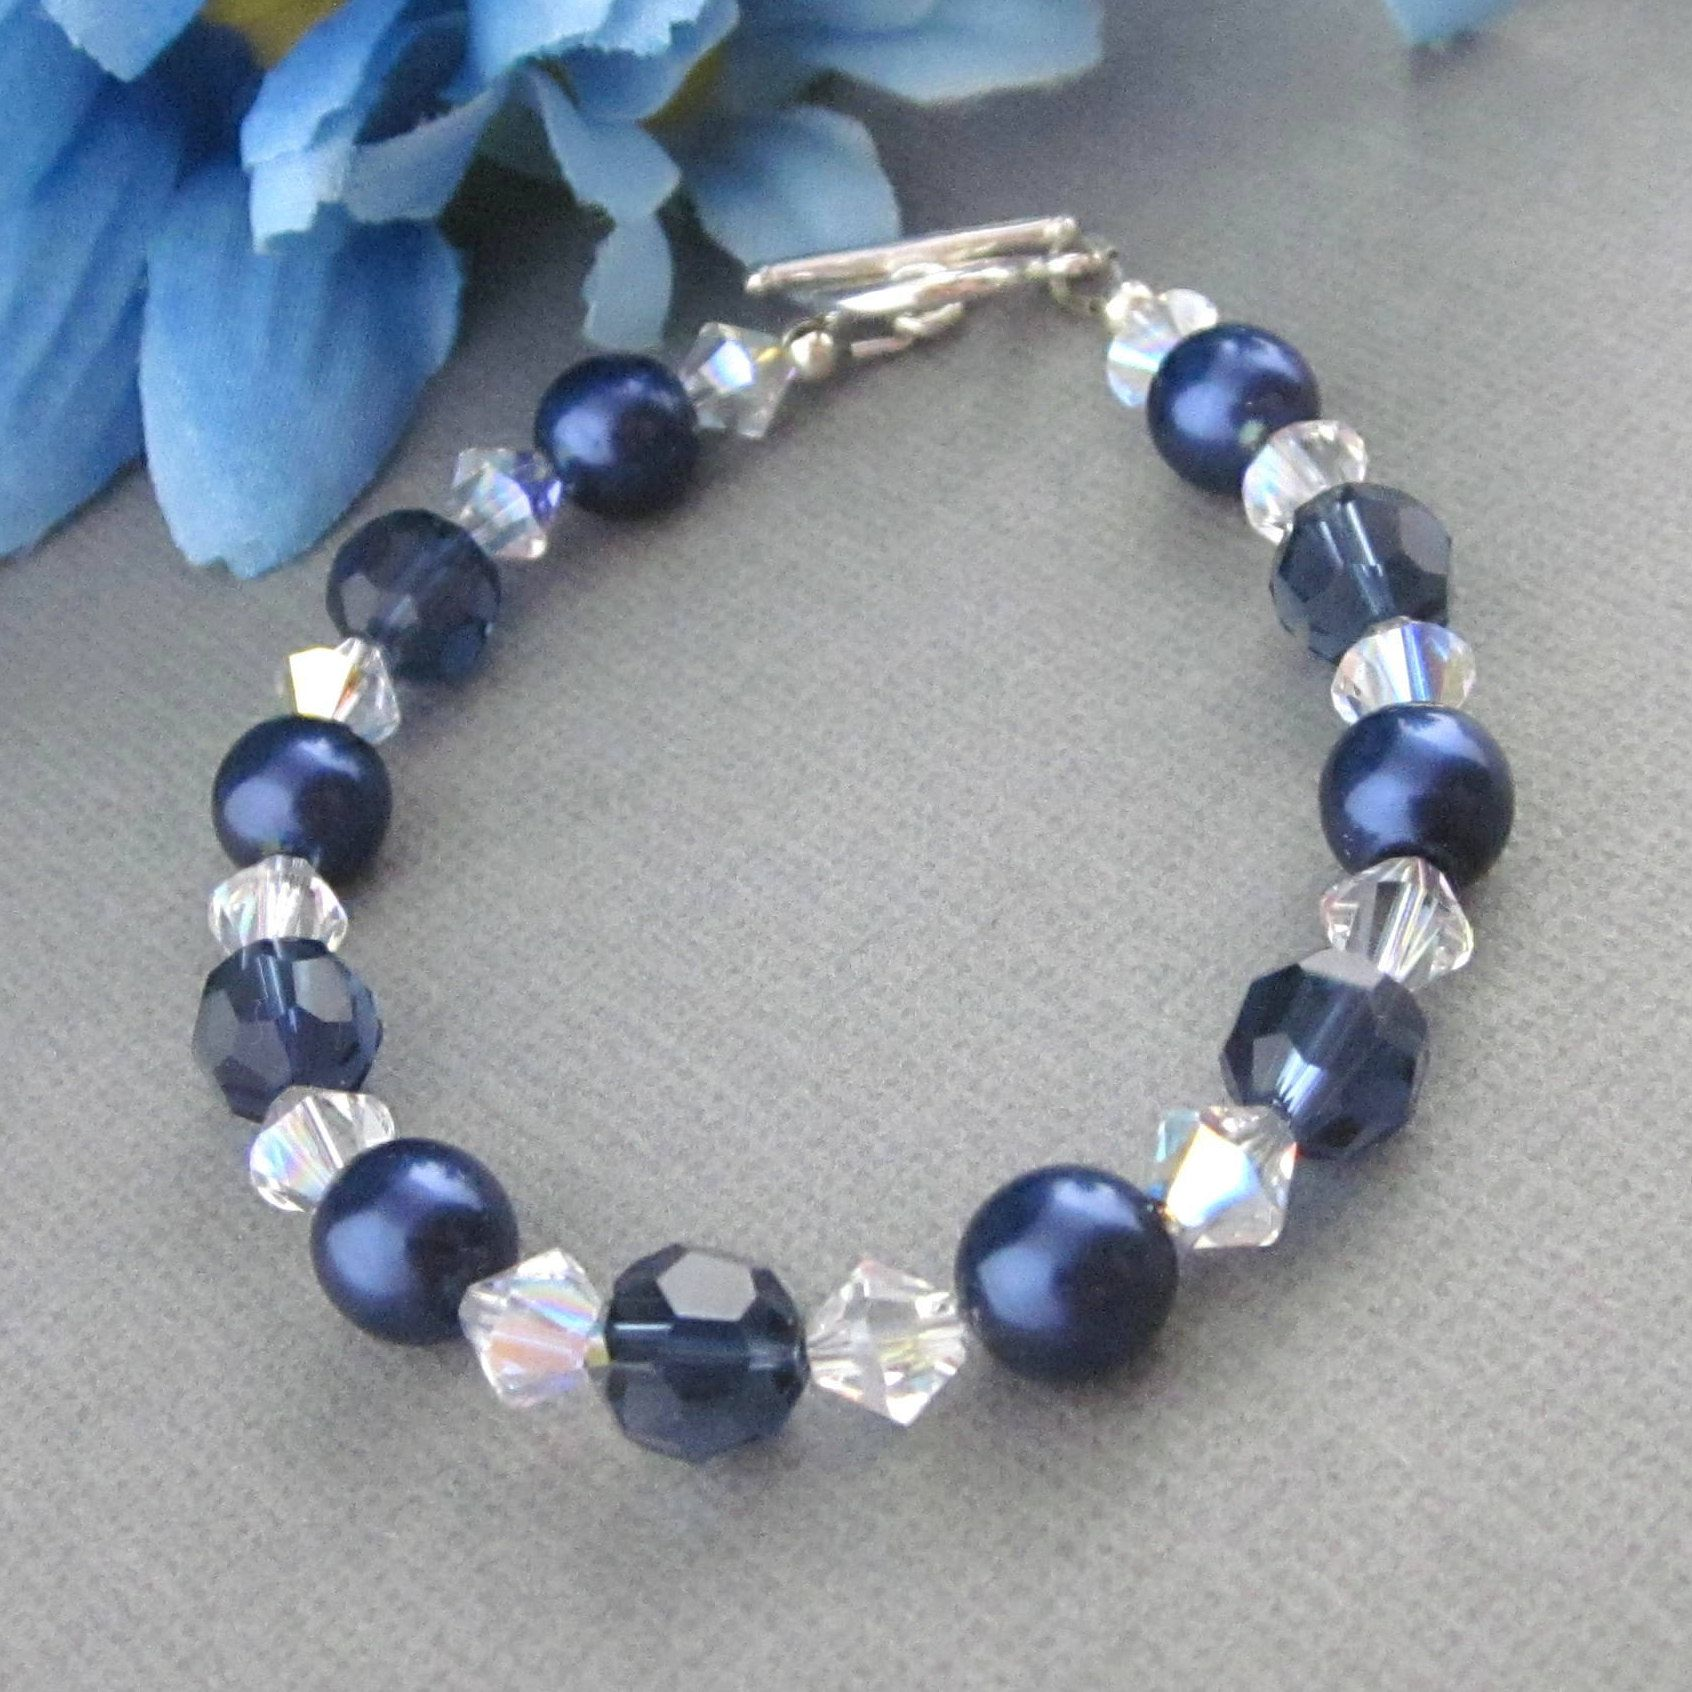 Blue Glass Bracelet Crystal Bracelet For New Mom Gift Adjustable Bracelet Sparkly Bracelet Jewelry Mother Gift New Mom Blue Round Bracelet